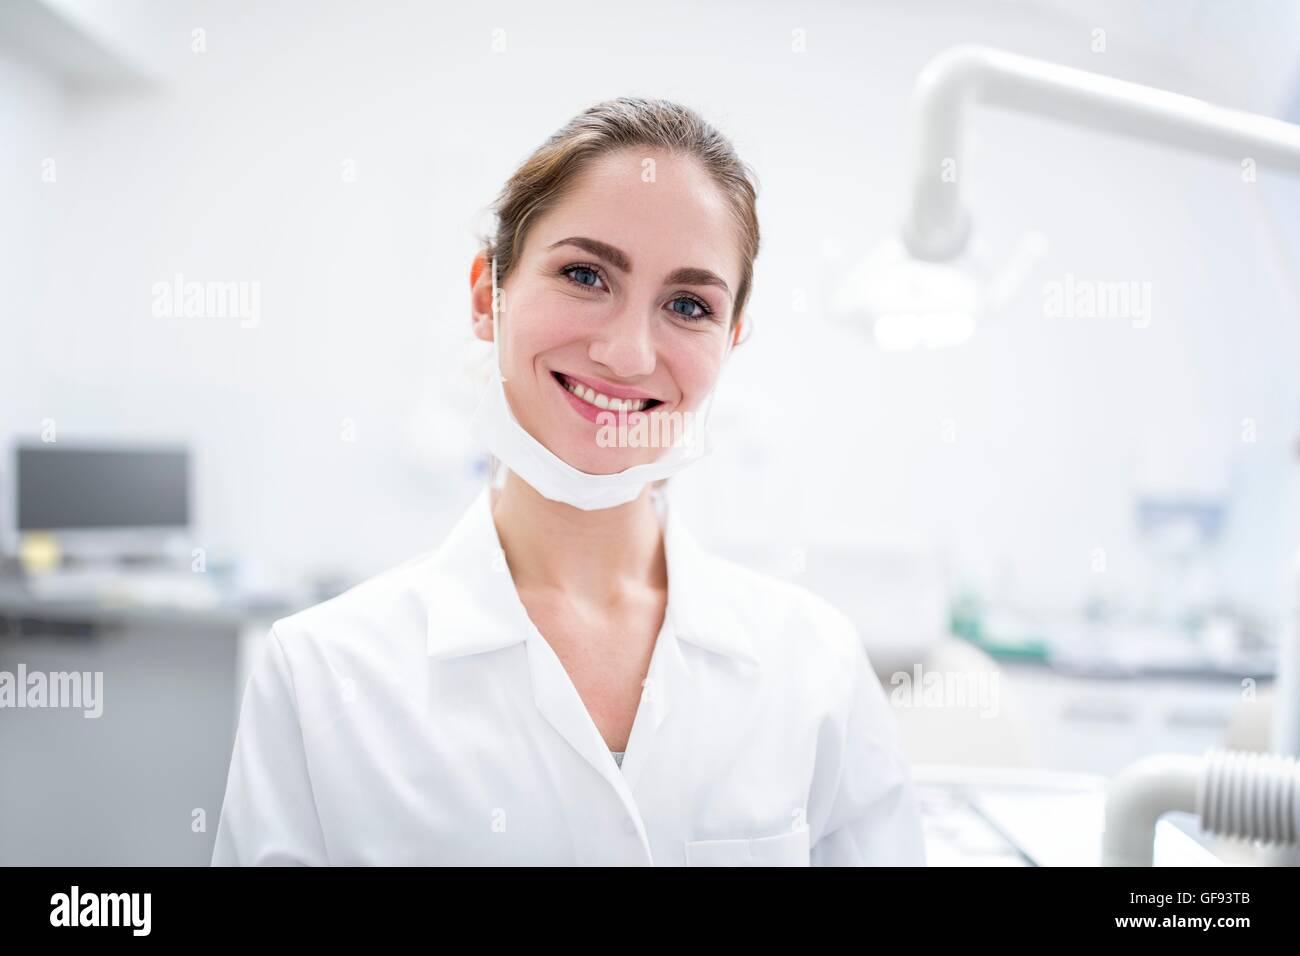 Modelo liberado. Close-up de joven dentista, retrato. Imagen De Stock